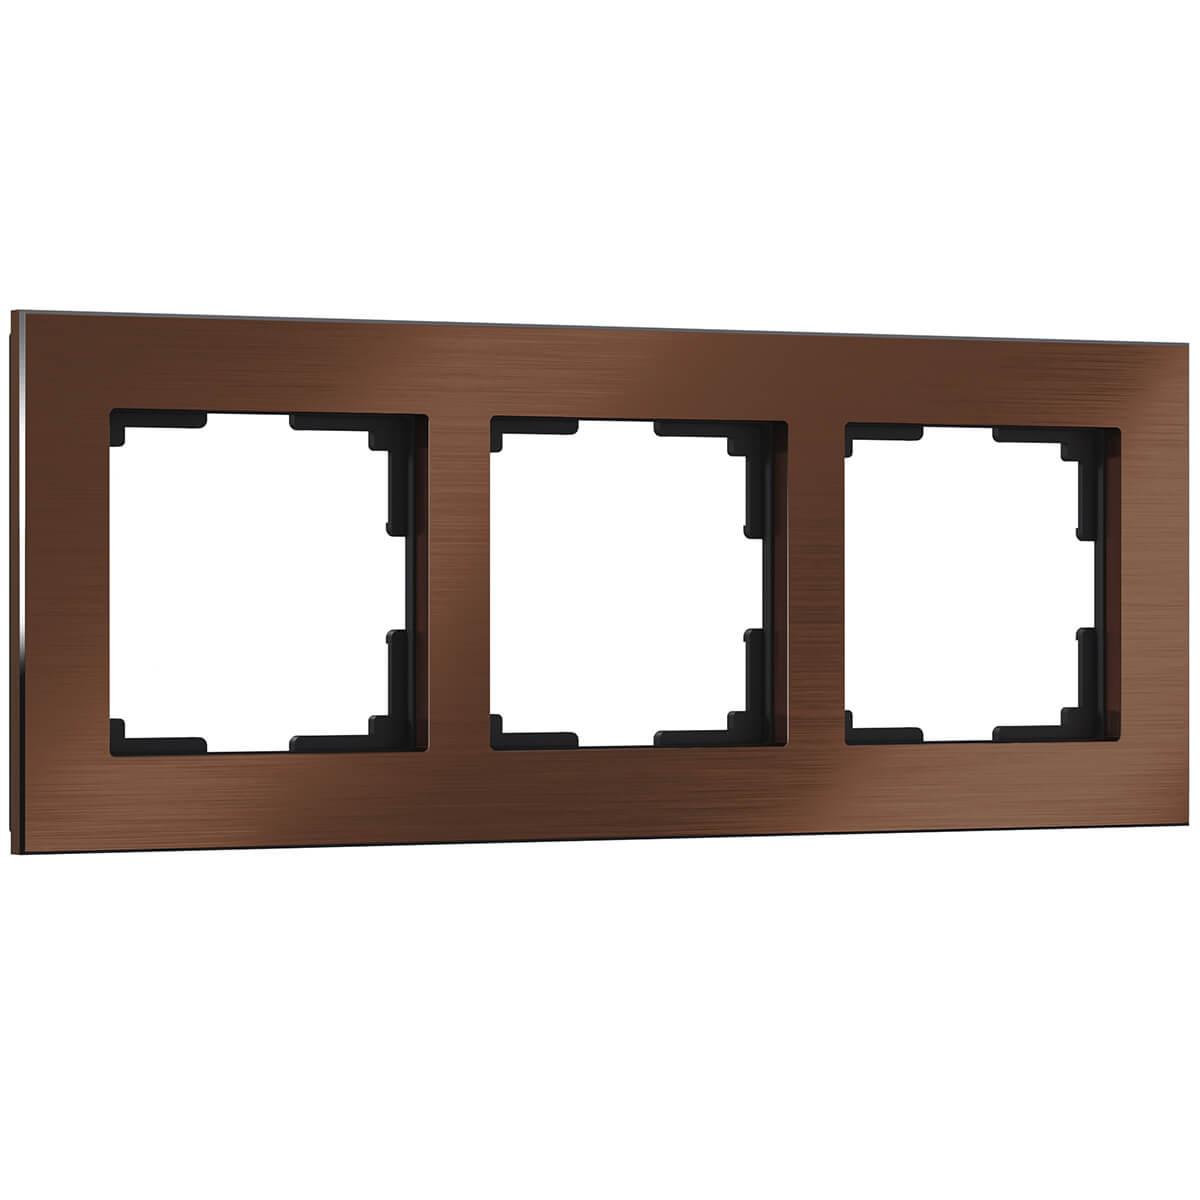 Рамка Aluminium на 3 поста алюминий коричневый WL11-Frame-03 4690389073700 цена и фото